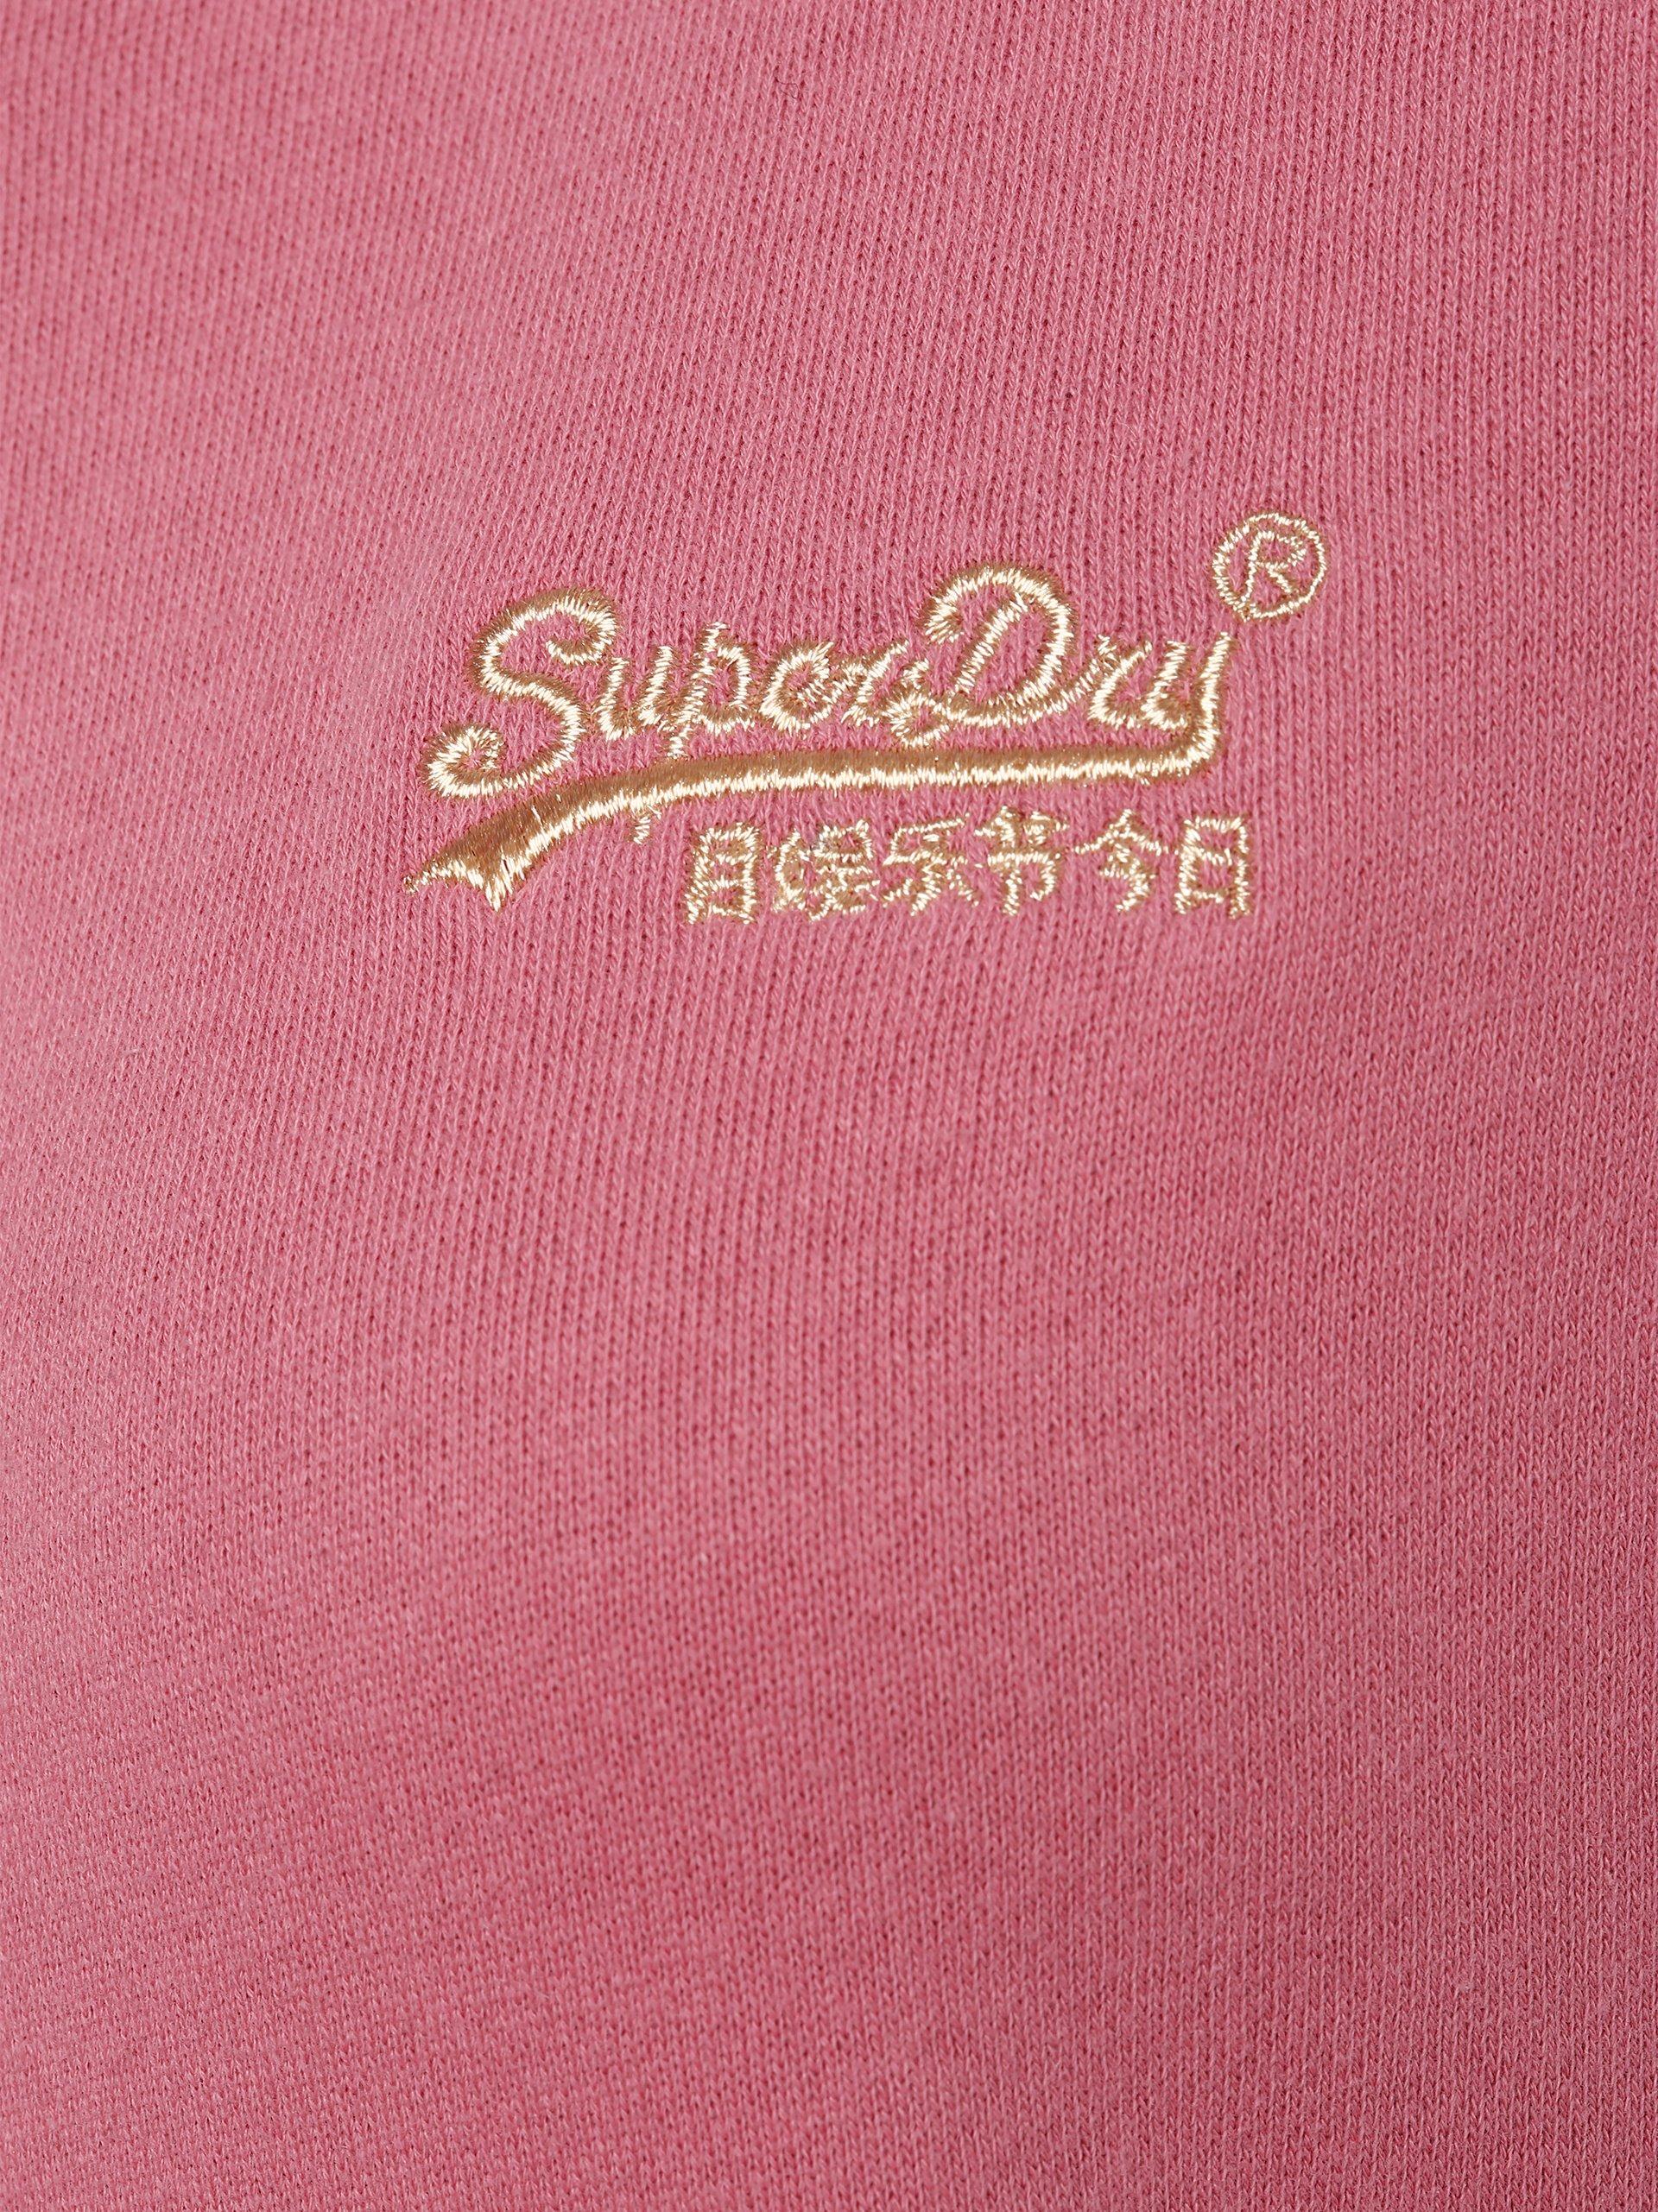 Superdry Damska bluza rozpinana